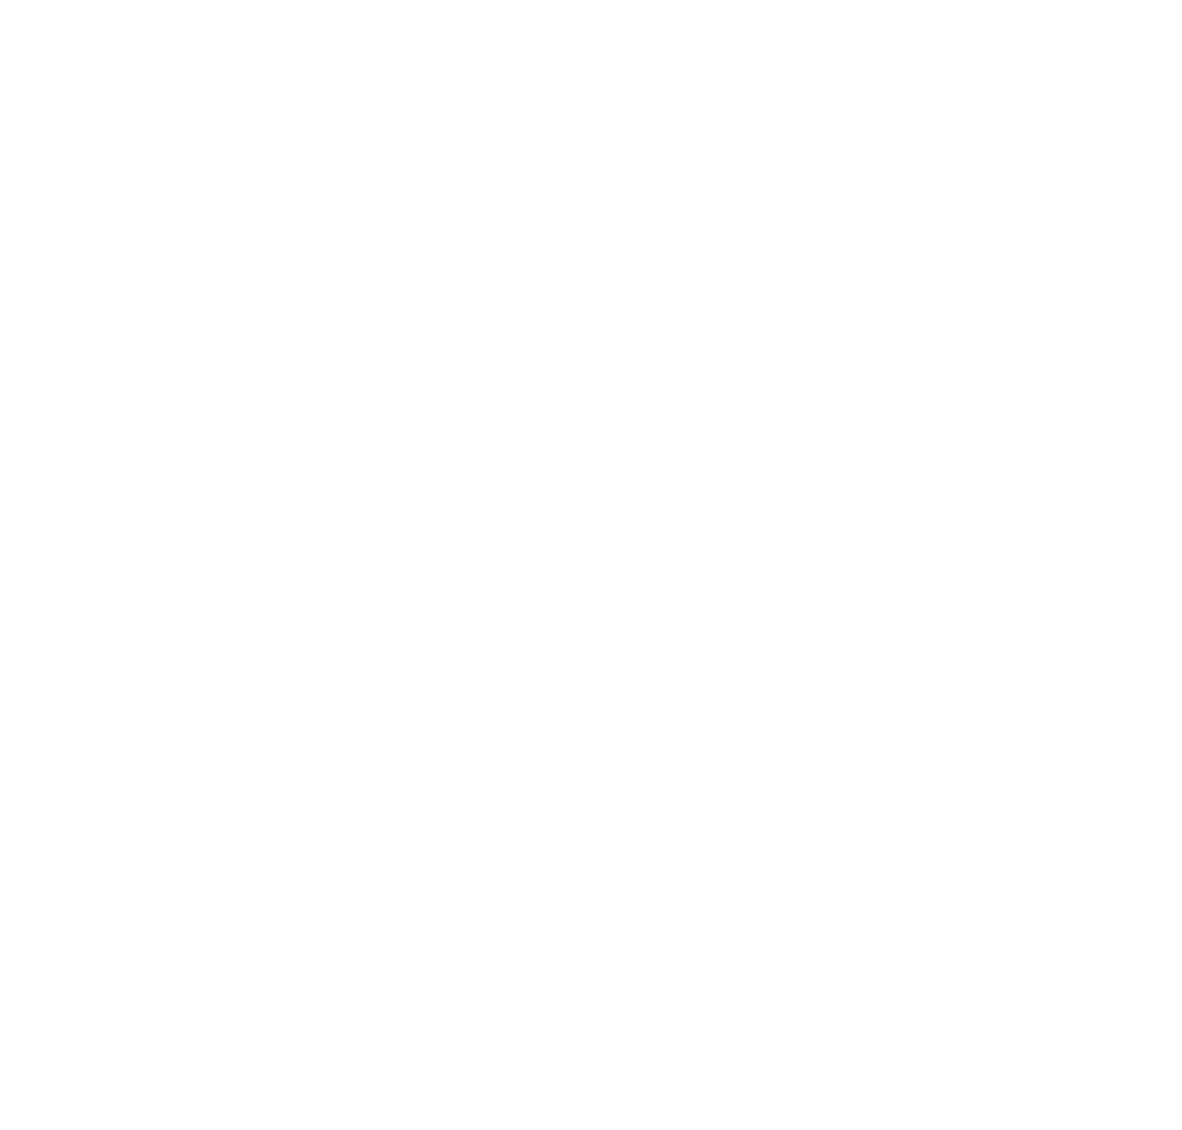 Terra - Grossiste alimentaire